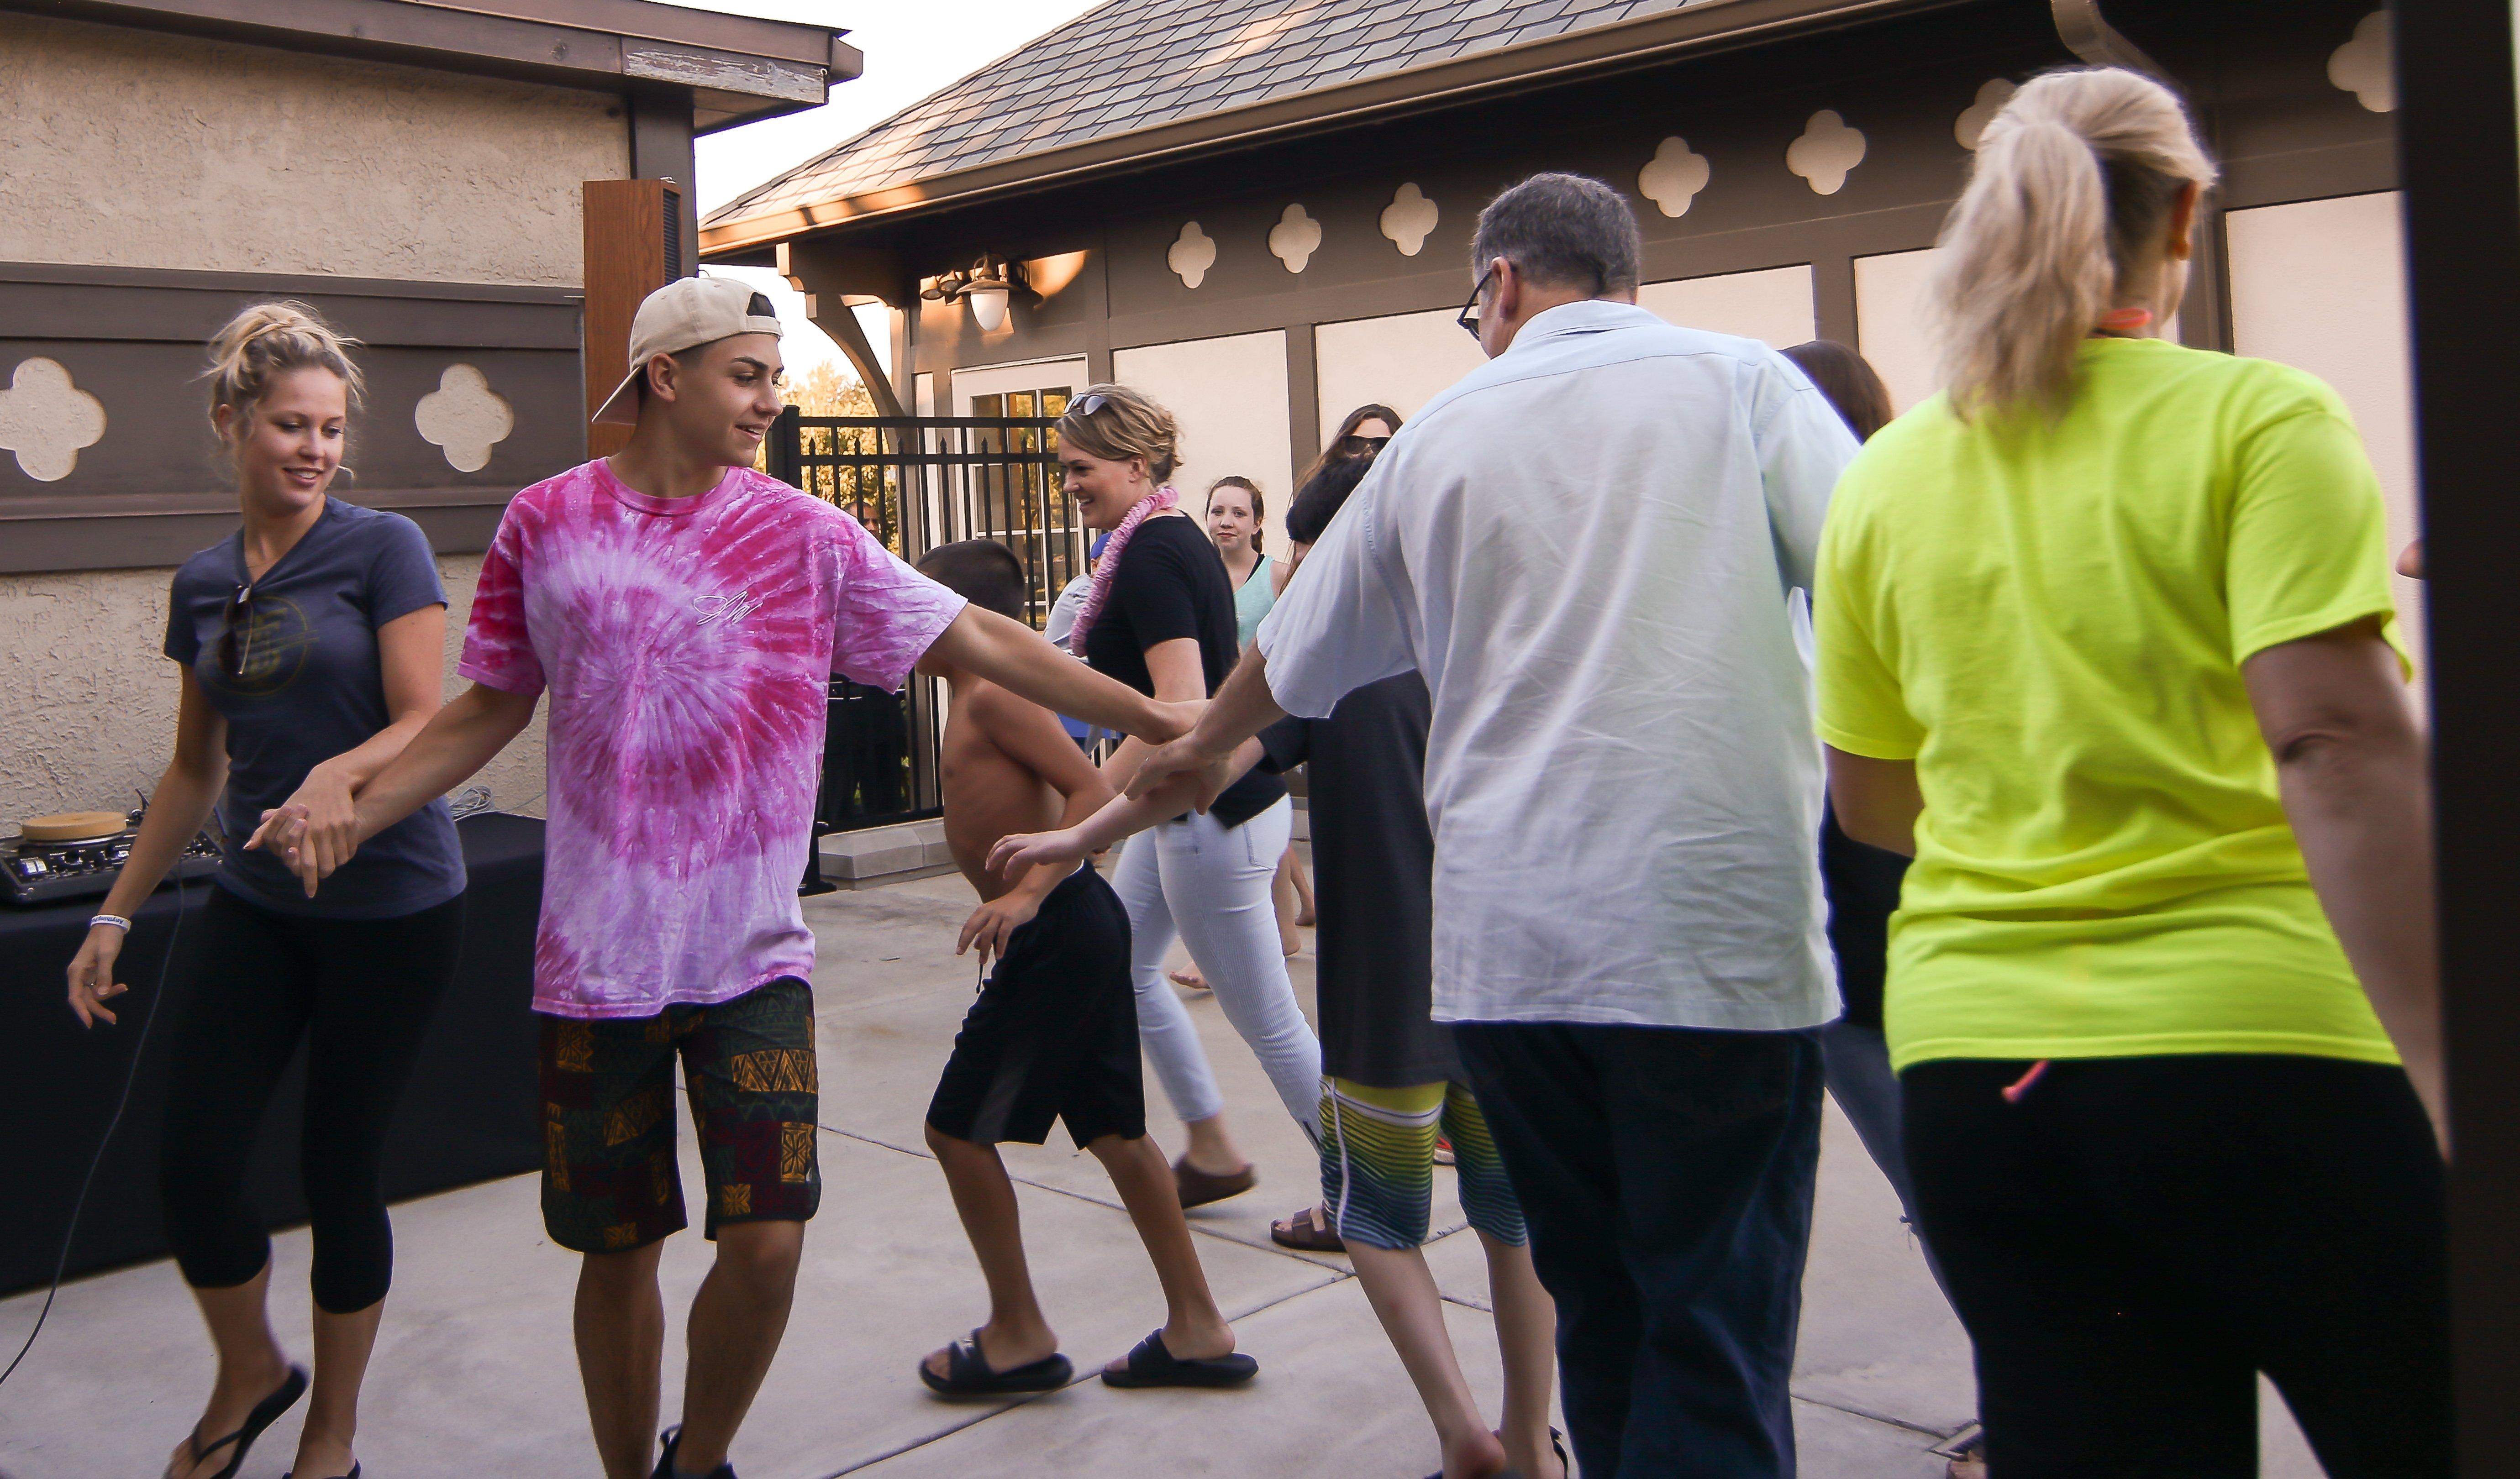 https://campkidsarekids.org/wp-content/uploads/2018/07/Evanston-CC-Dancing-17.jpg